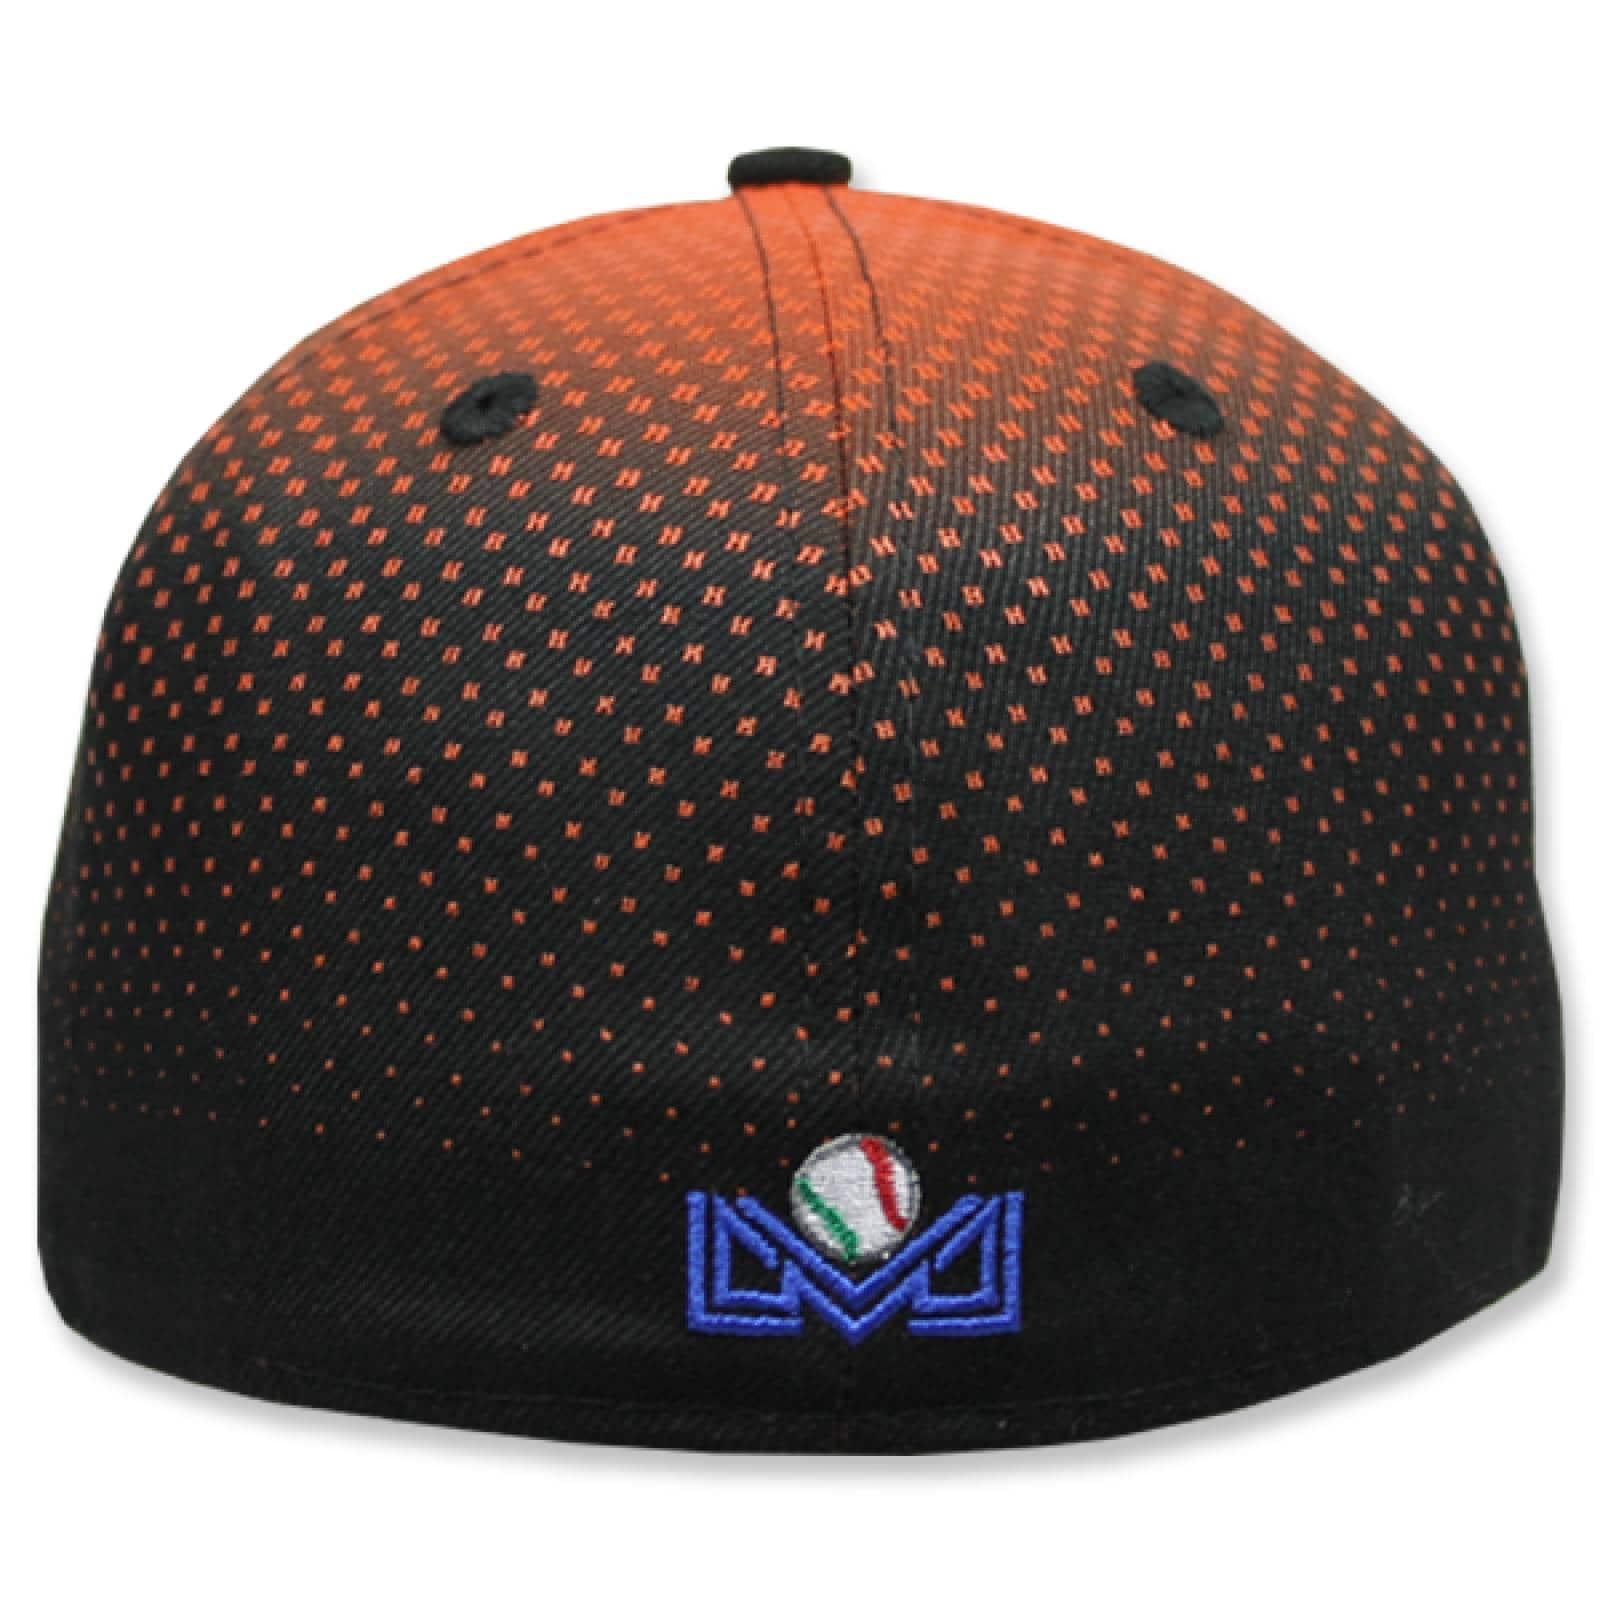 Gorra New Era 5950 Degraded Game Cap Naranjeros Black